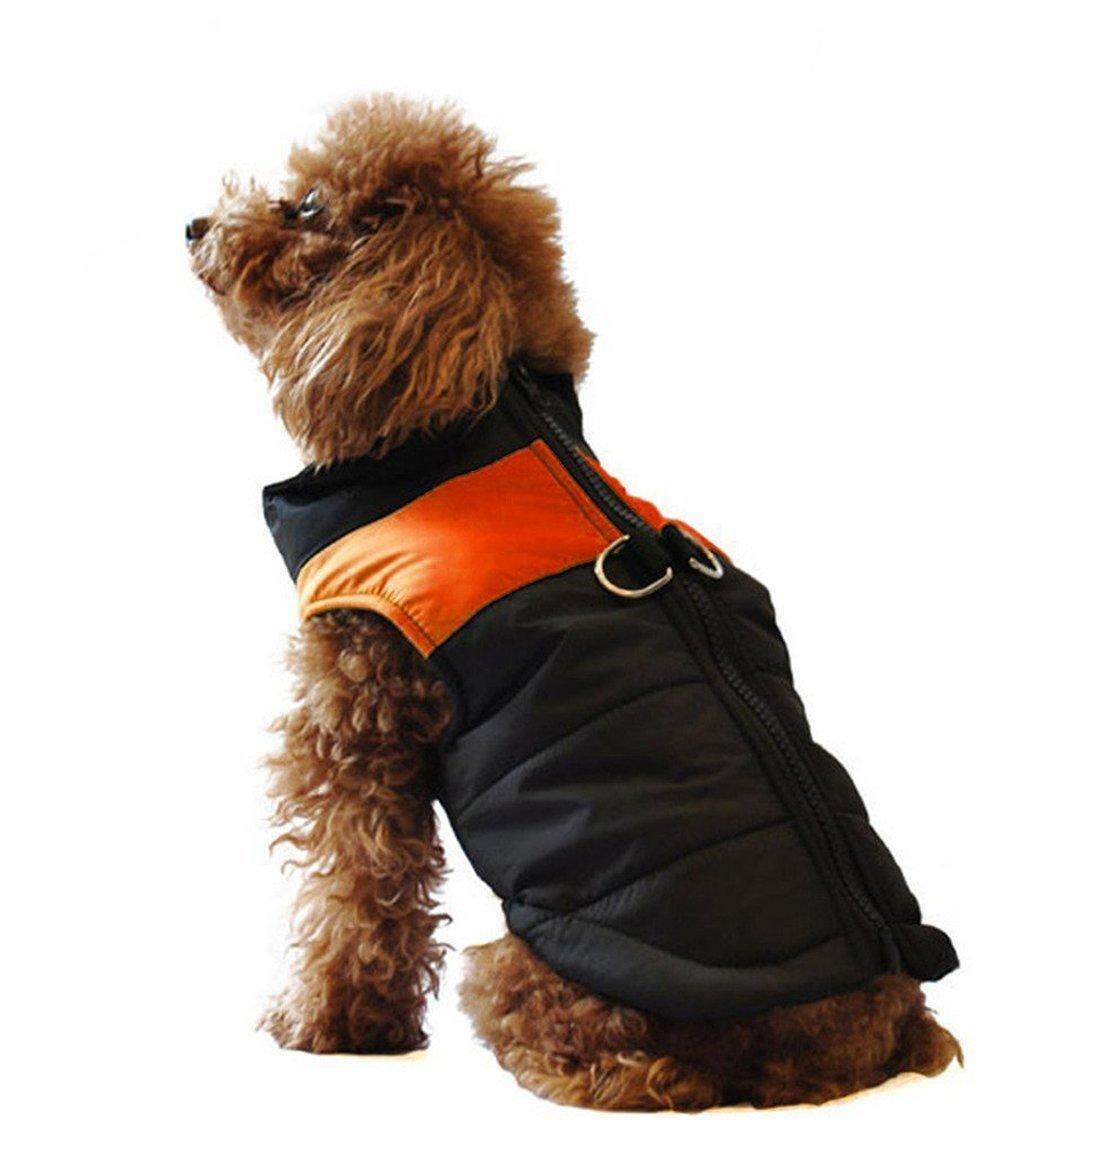 GabeFish Dog Warm Padded Cotton Waterproof Jackets Pets Winter Zipper Clothes Vest Coat Skiwear Orange 4X-Large